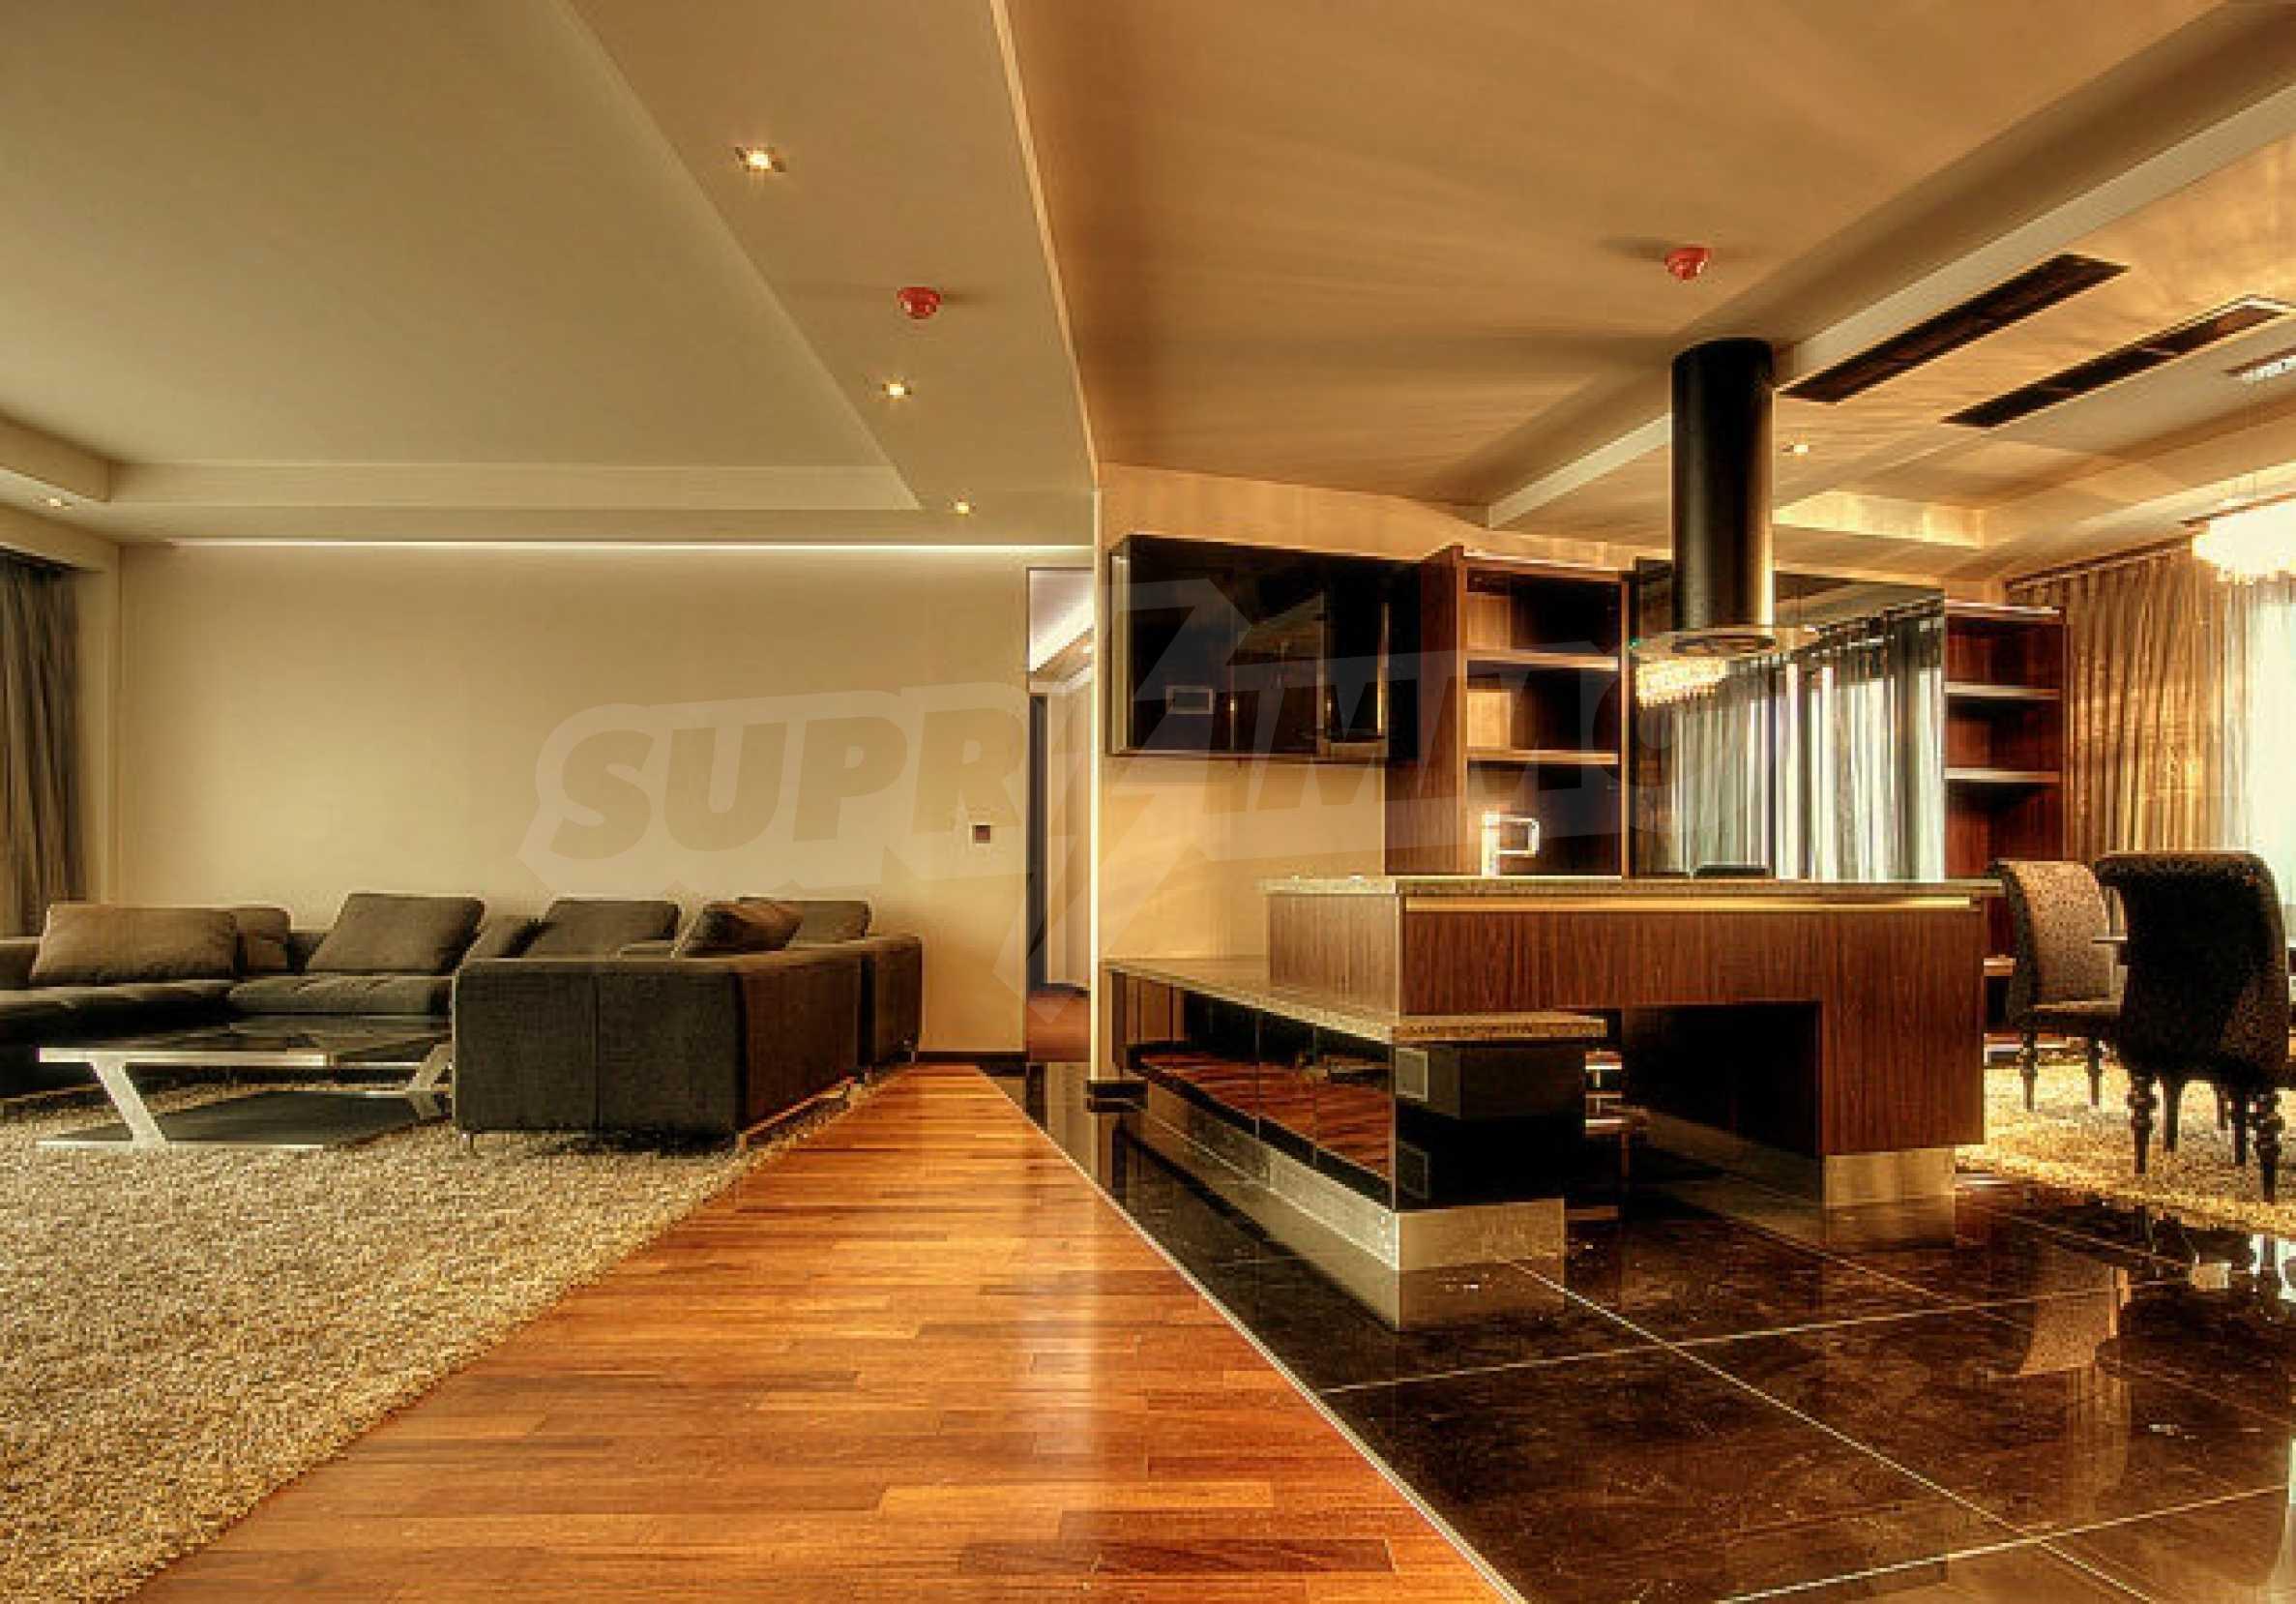 Abu Dhabi apartments 4